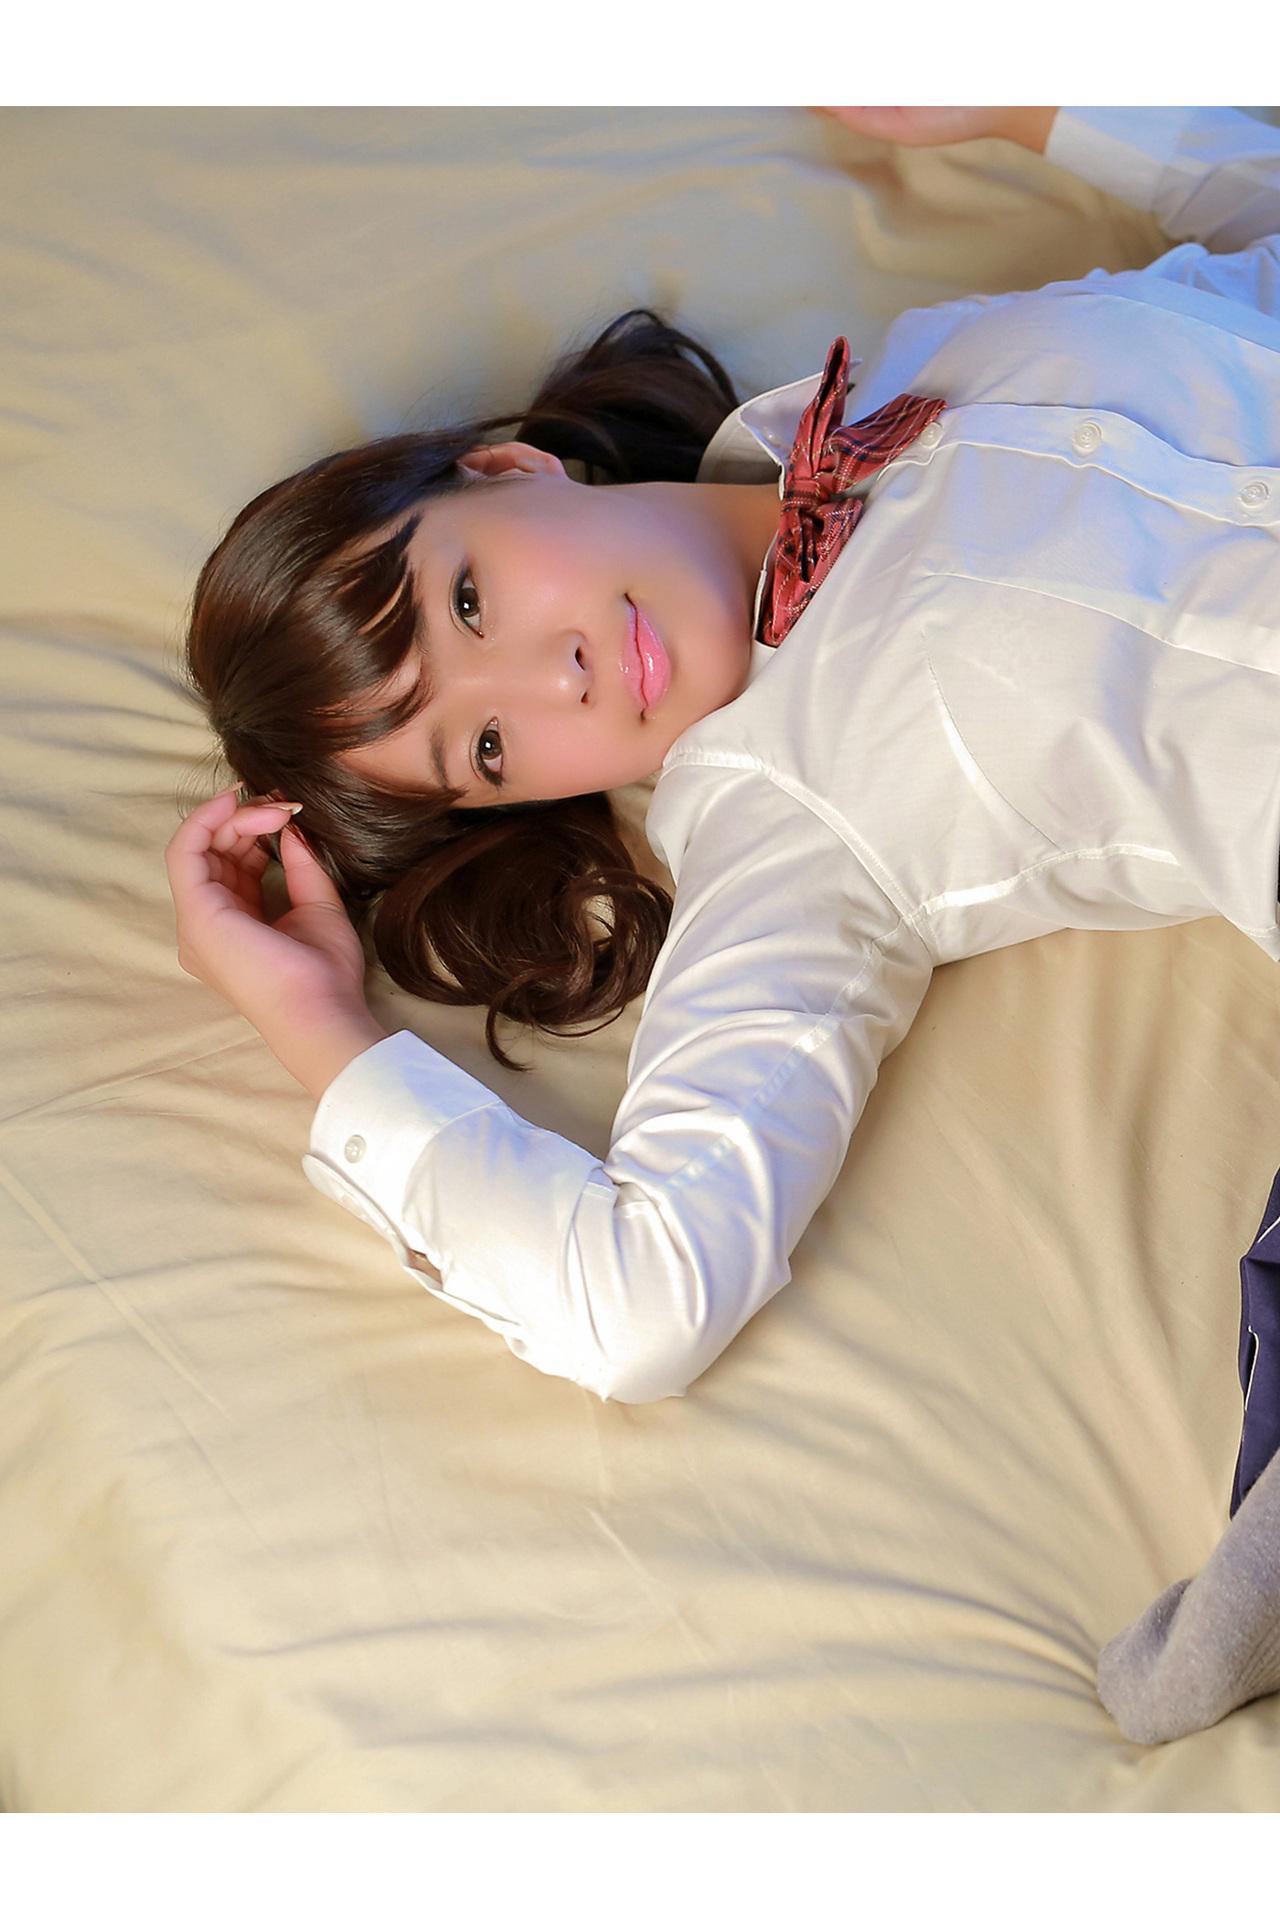 Rina Hashimoto031